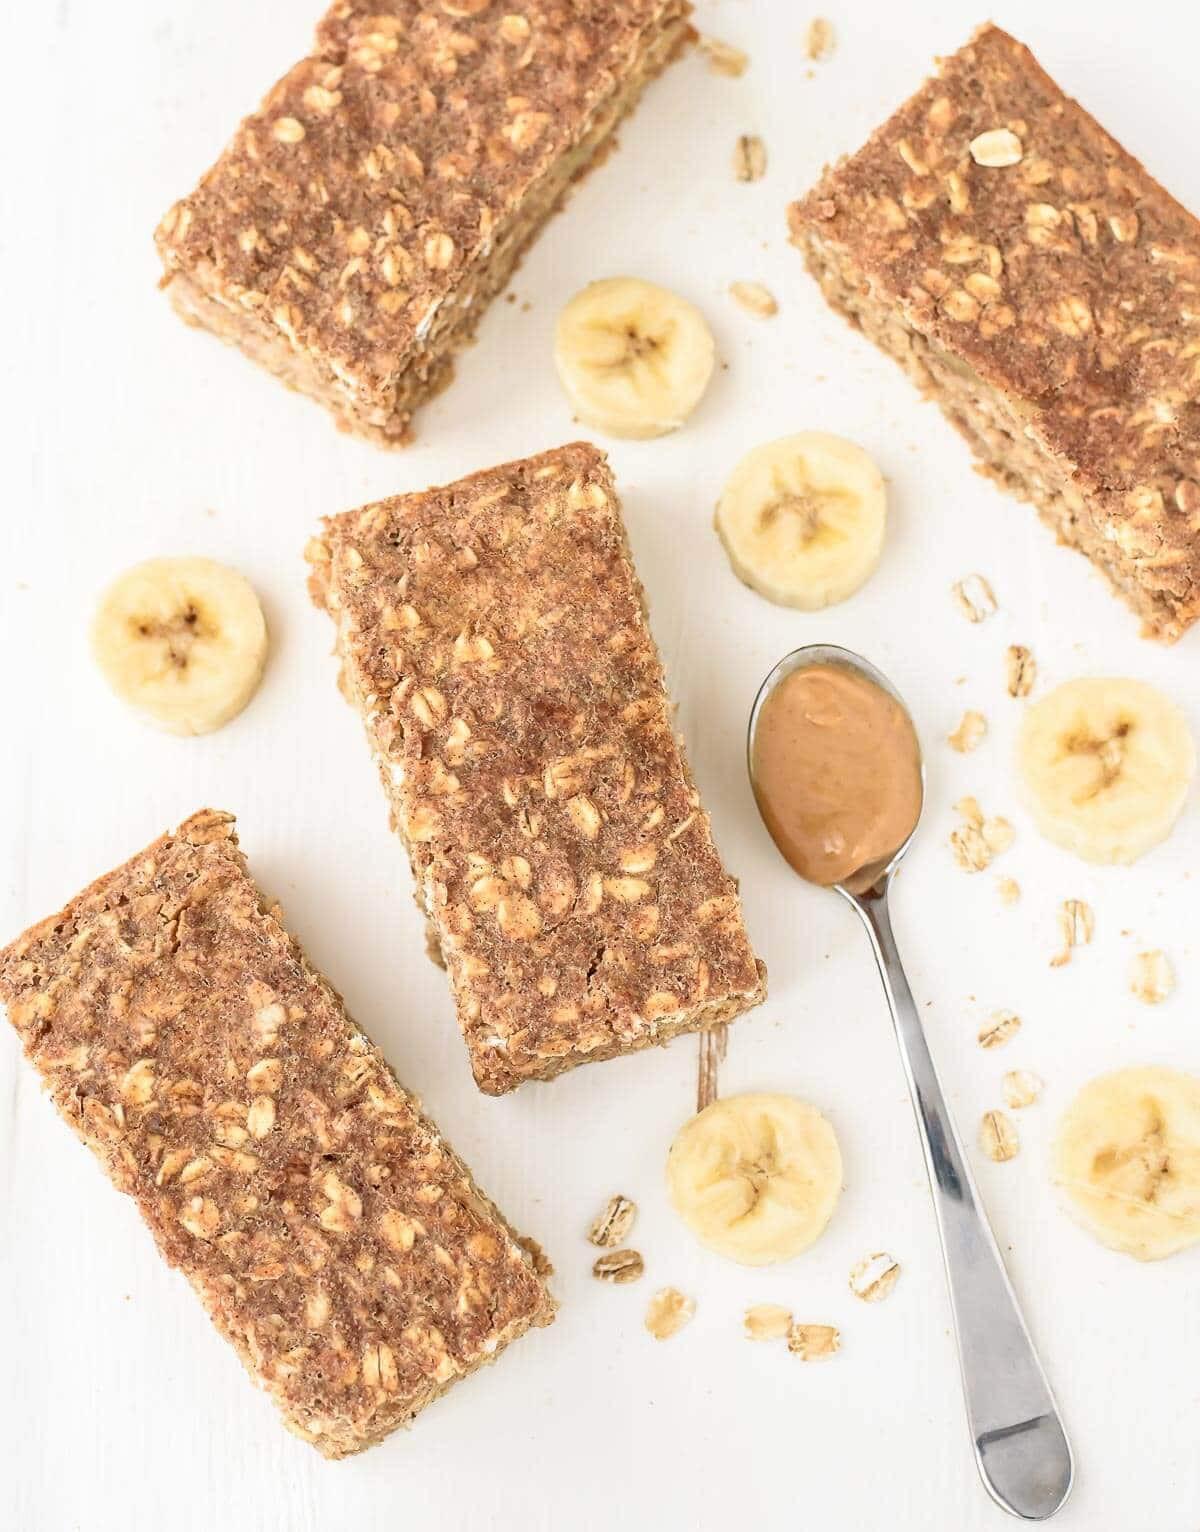 Healthy Oatmeal Breakfast Bars Recipe Easy  easy healthy oatmeal bars